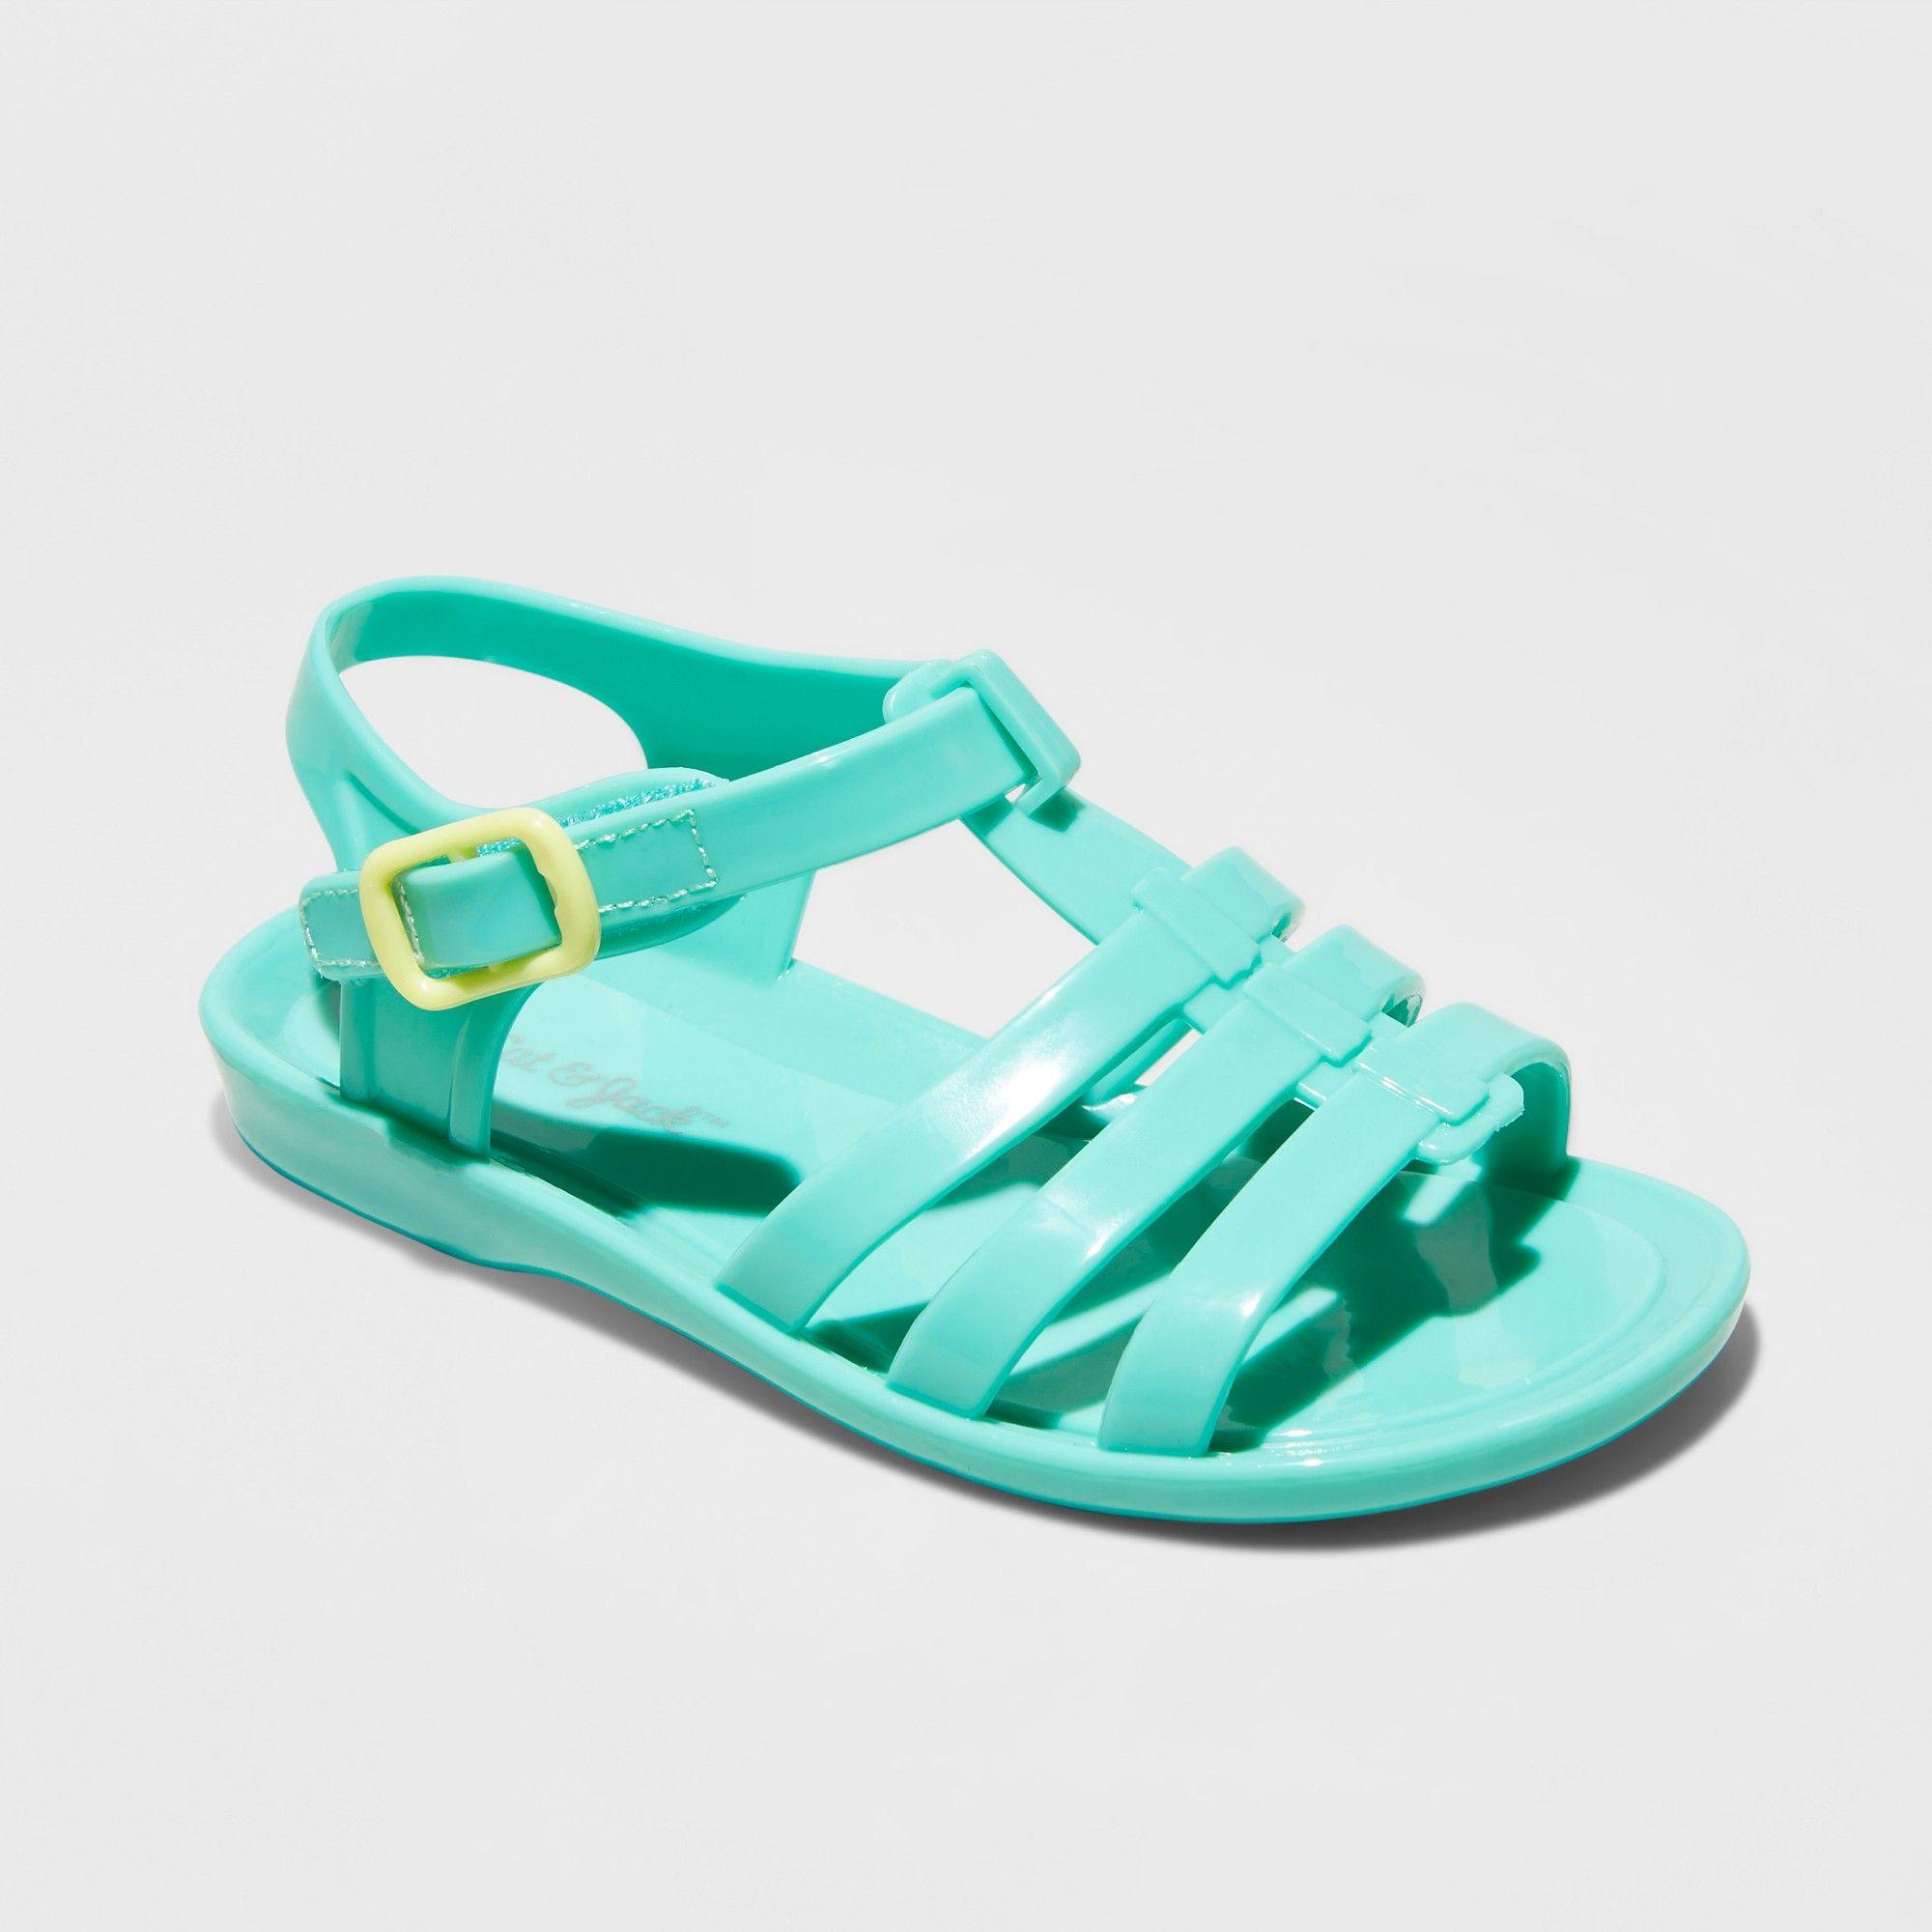 acb75288bf9e Toddler Girls' Annabella Fisherman Slide Sandals - Cat & Jack Mint XL, Blue